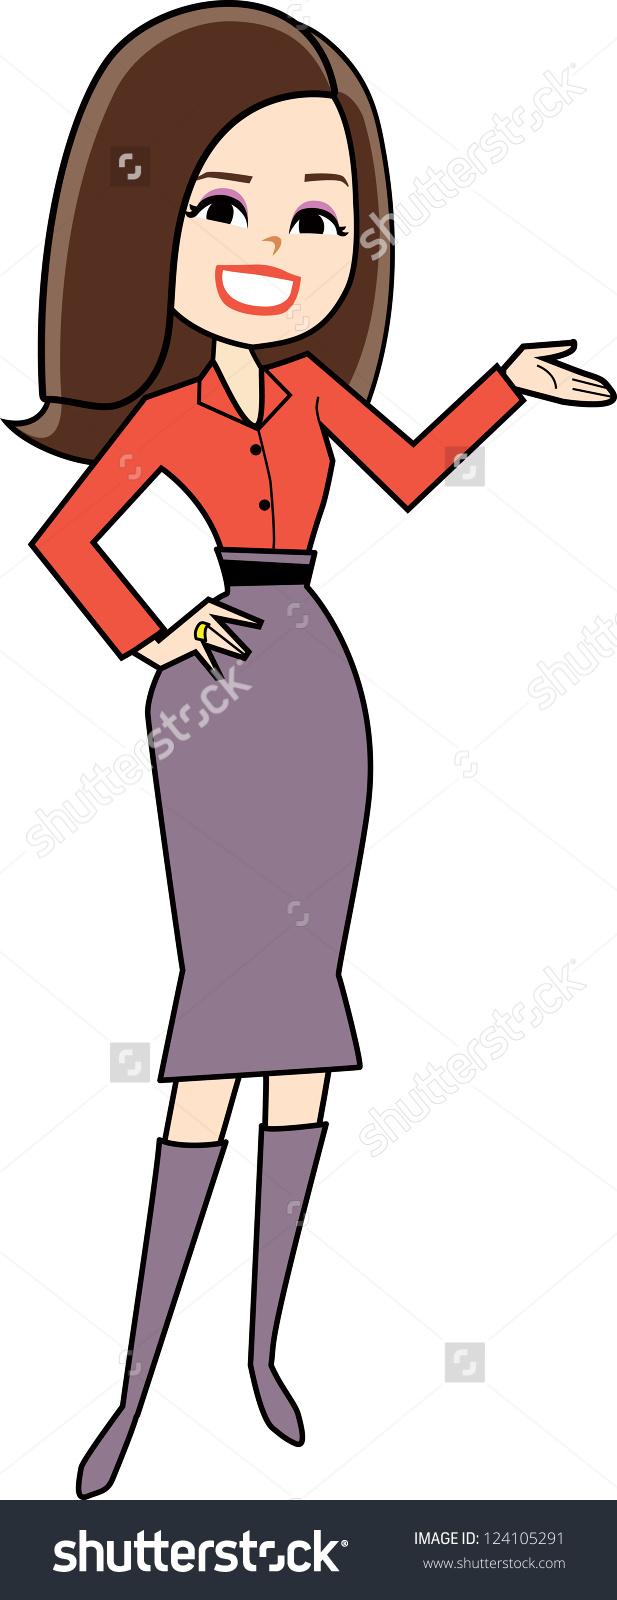 Cartoon Woman Clipart Retro Style Drawin-Cartoon Woman Clipart Retro Style Drawing Stock Vector 124105291 .-7